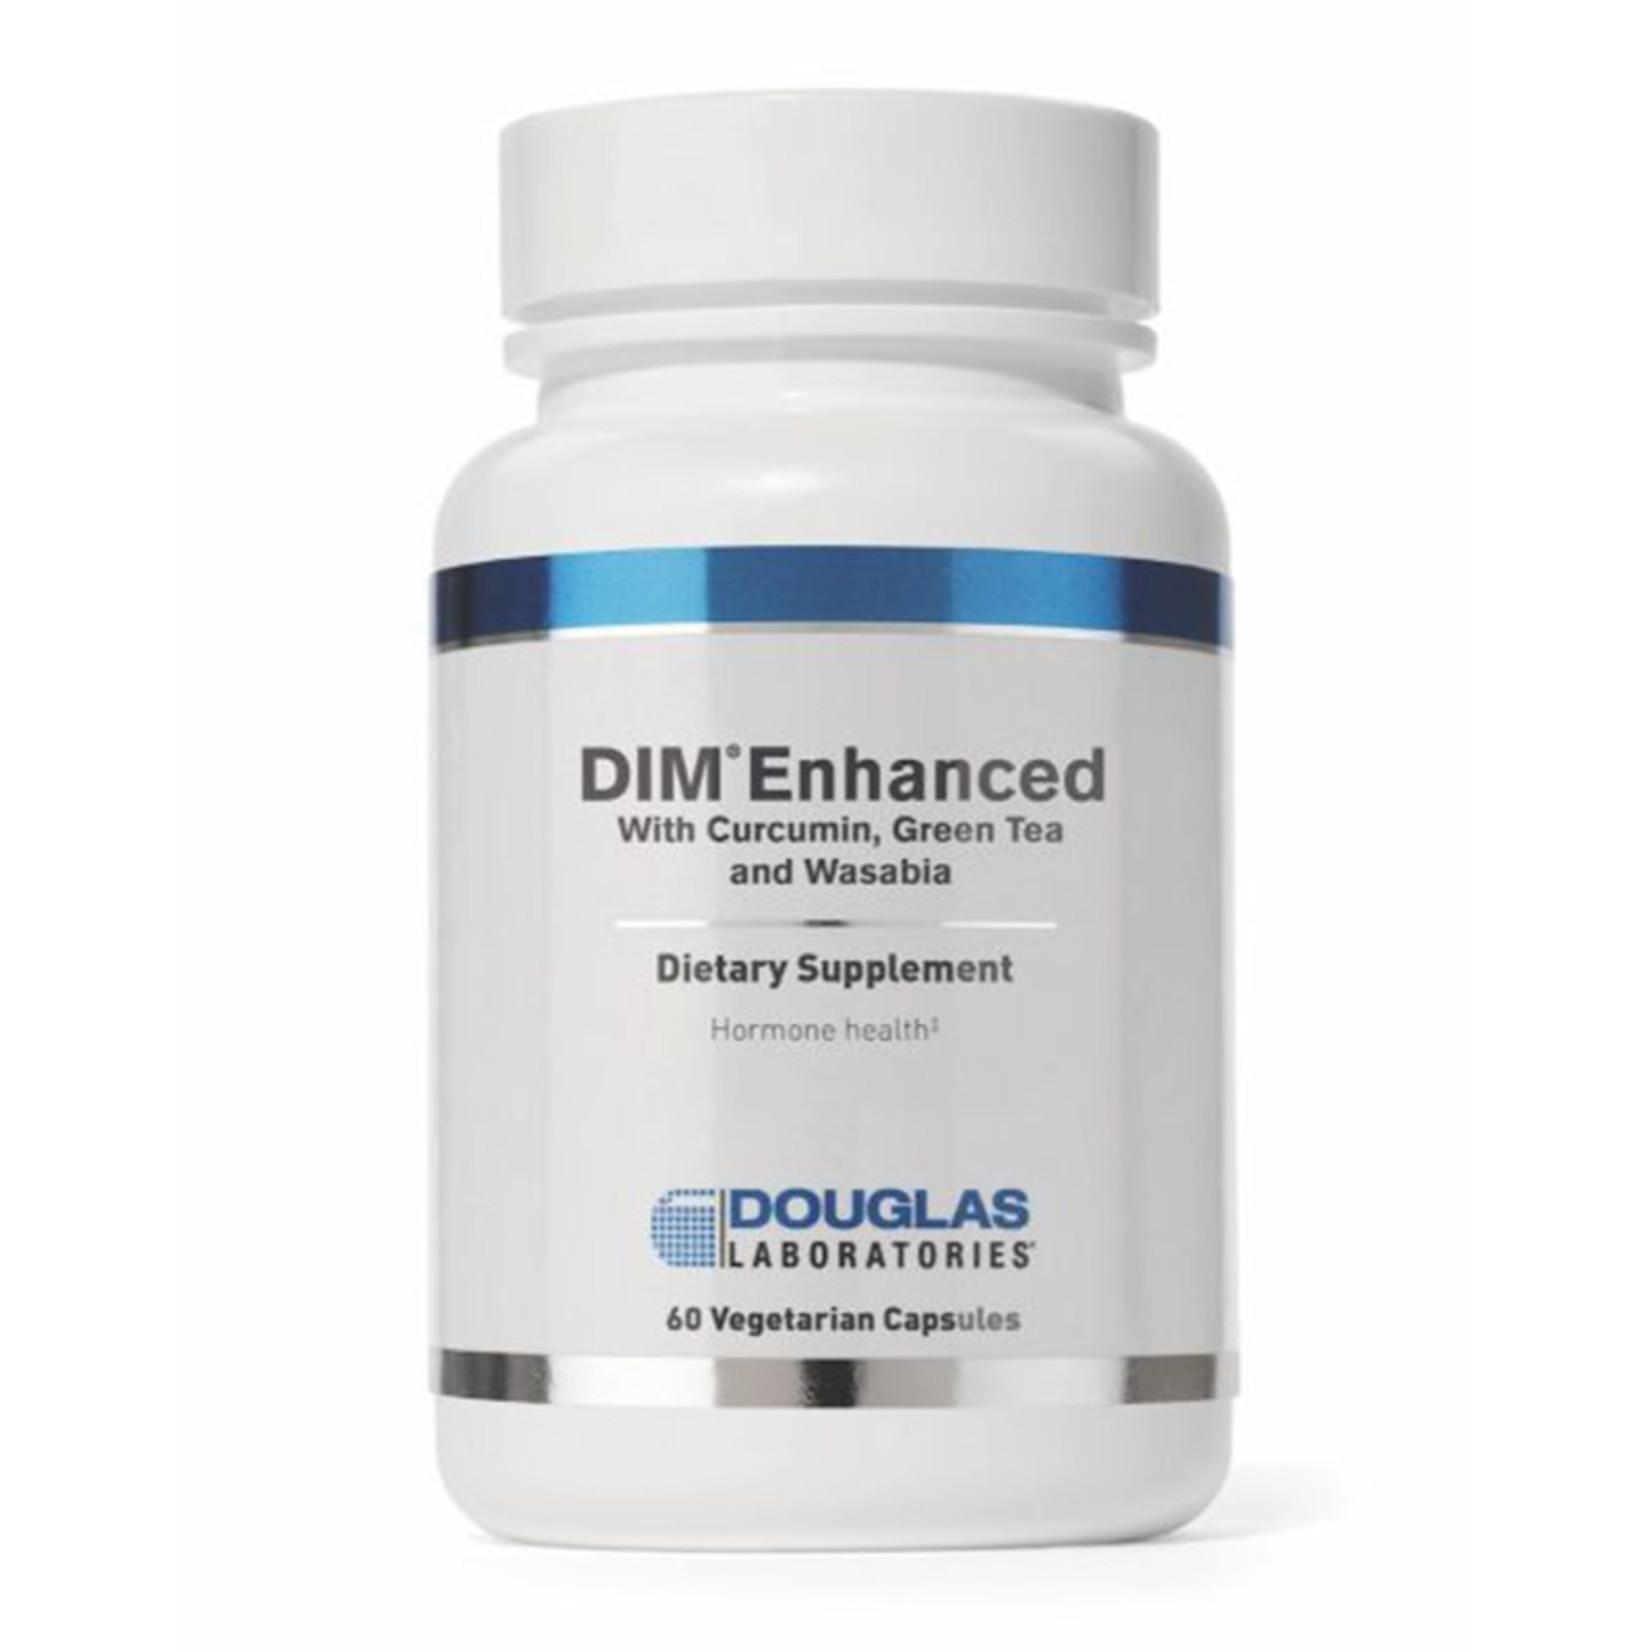 Douglas Labs DIM Enhanced